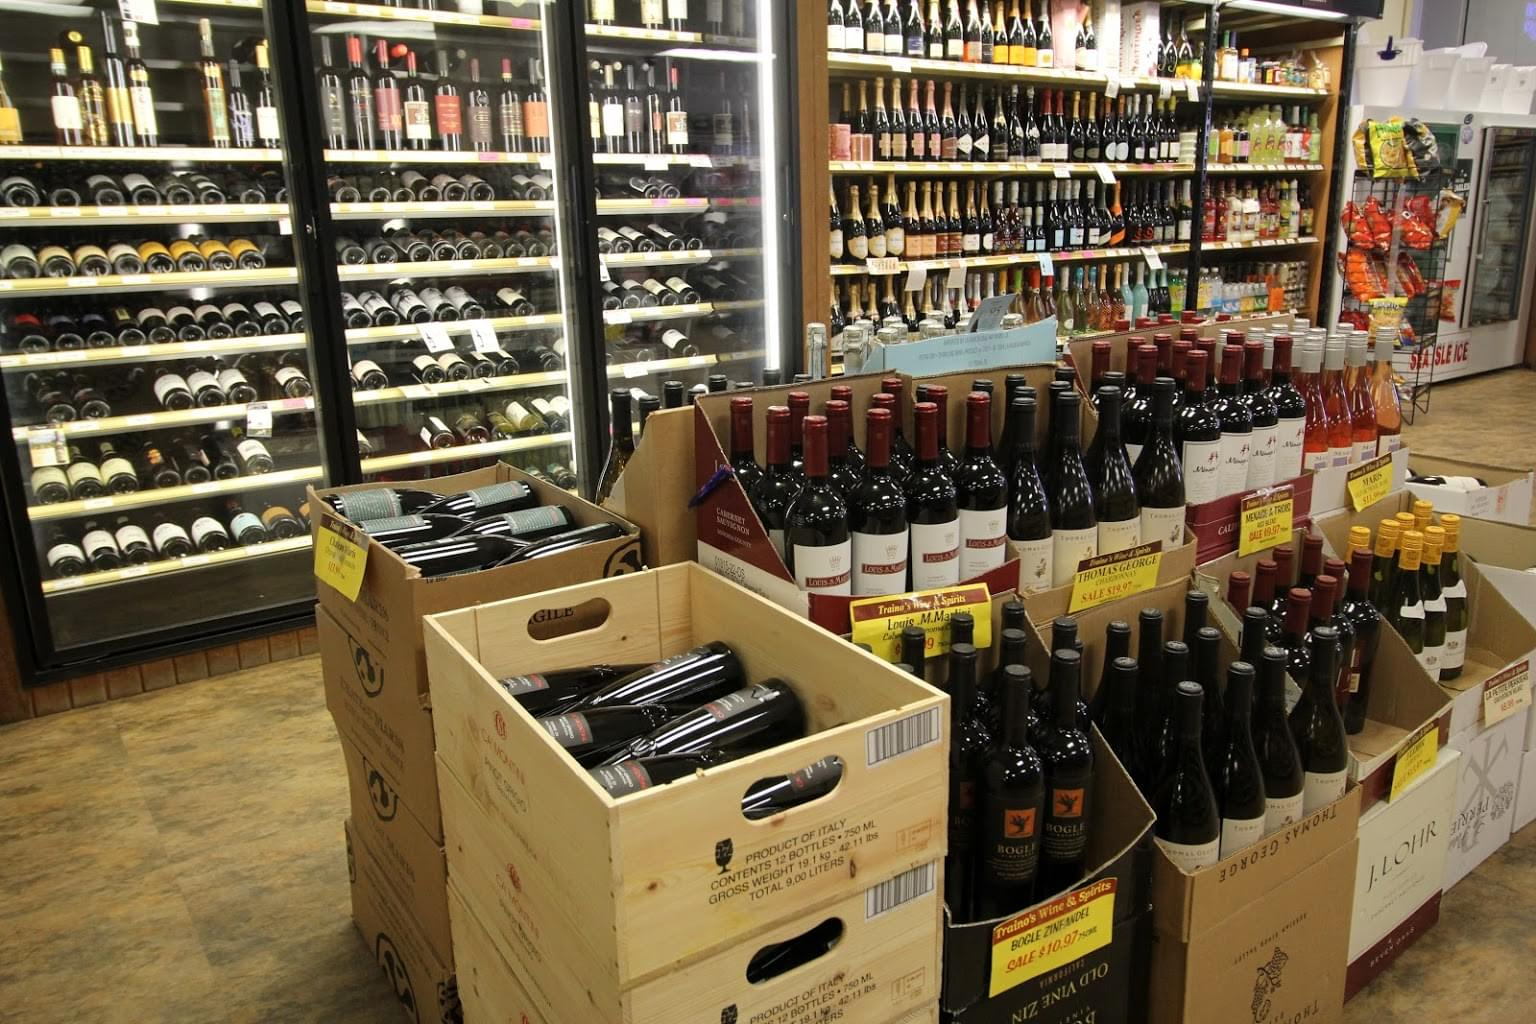 Traino's Wine & Spirits Liquor Store in Voorhees, NJ